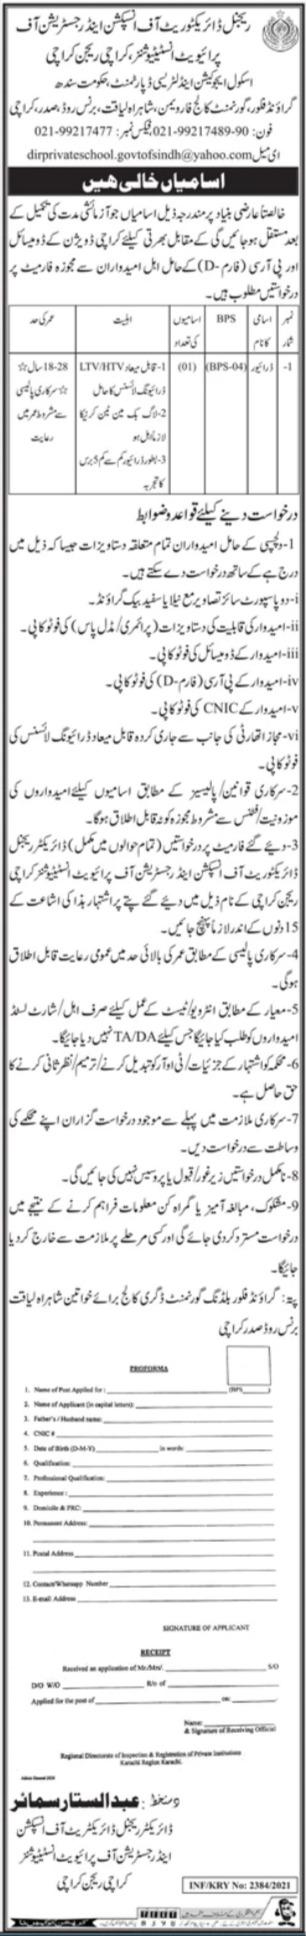 Jobs in School Education & Literacy Department in Karachi 2021